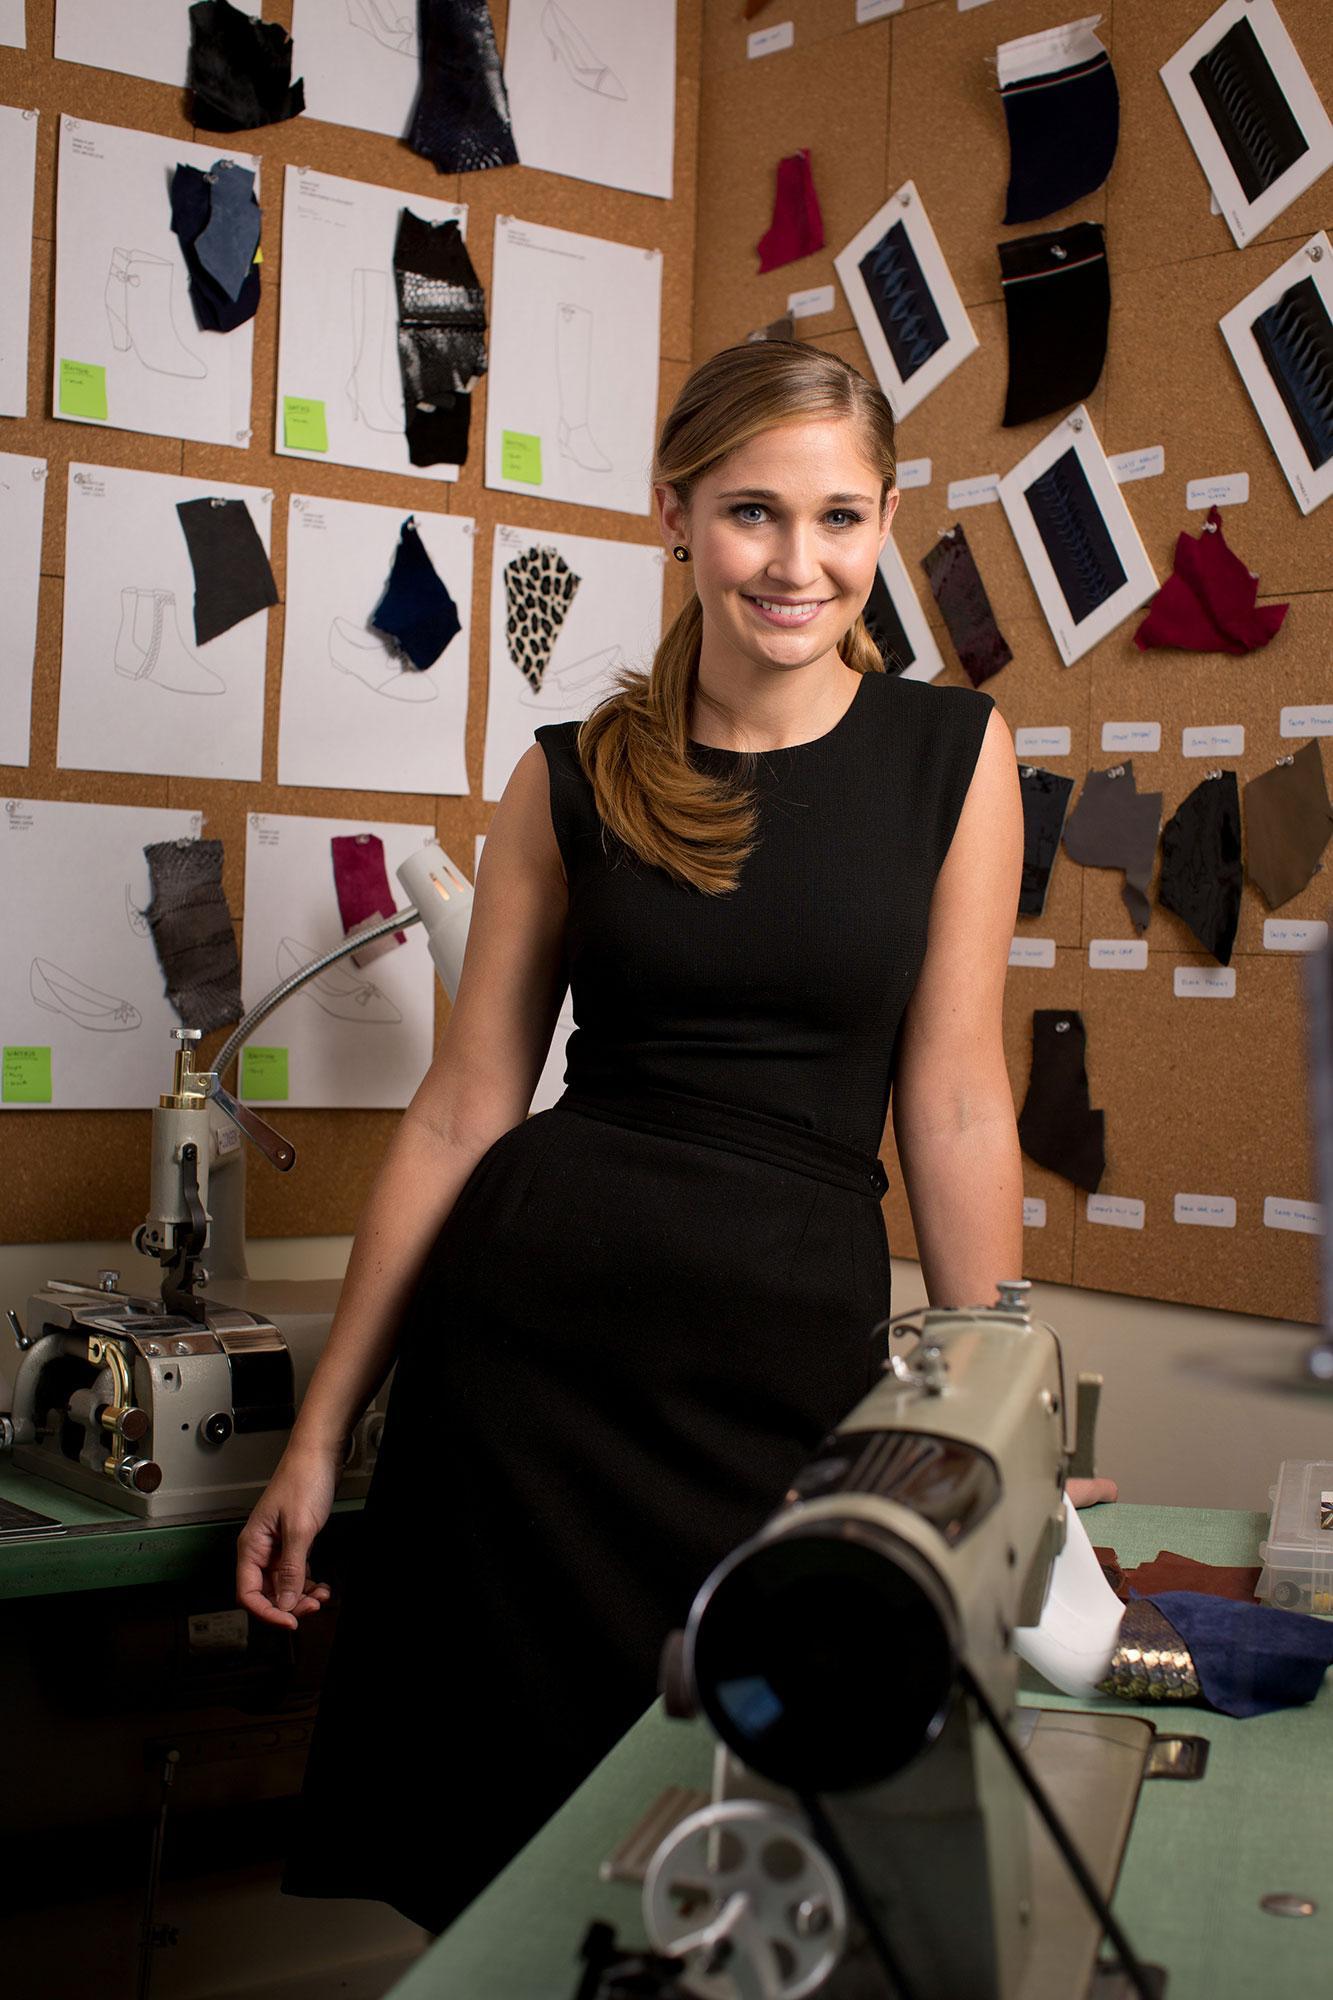 The stylish New York shoe designer @SarahFlint_nyc shares her shopping secrets: http://t.co/SCjmovxzUz http://t.co/h6gcrD6lNb